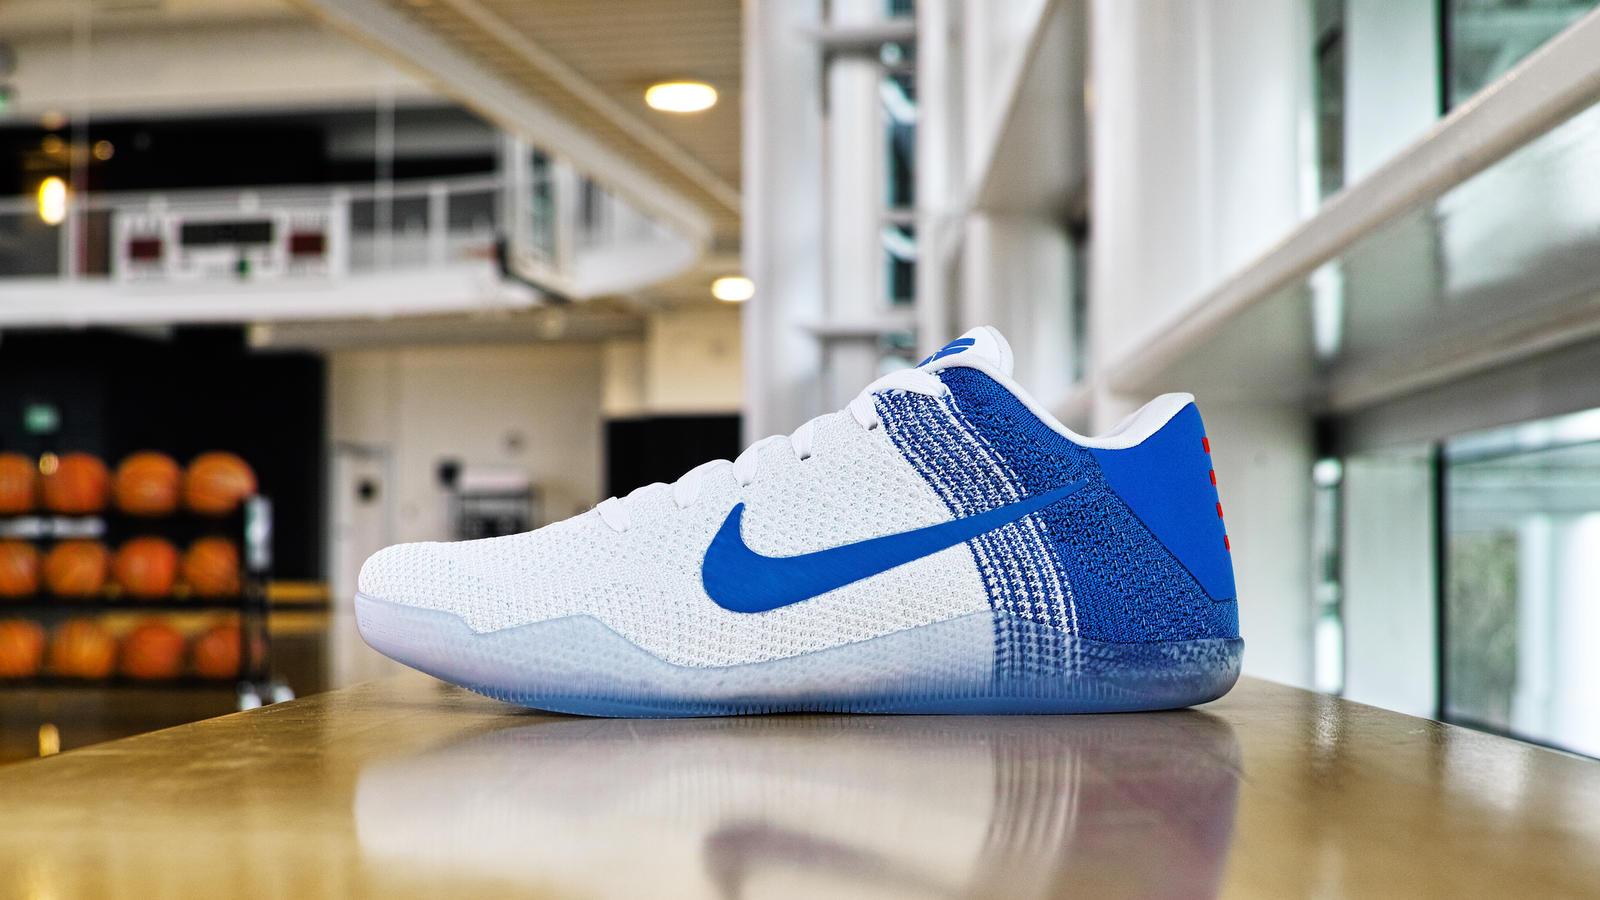 KOBE 11 Elite PE - Nike News